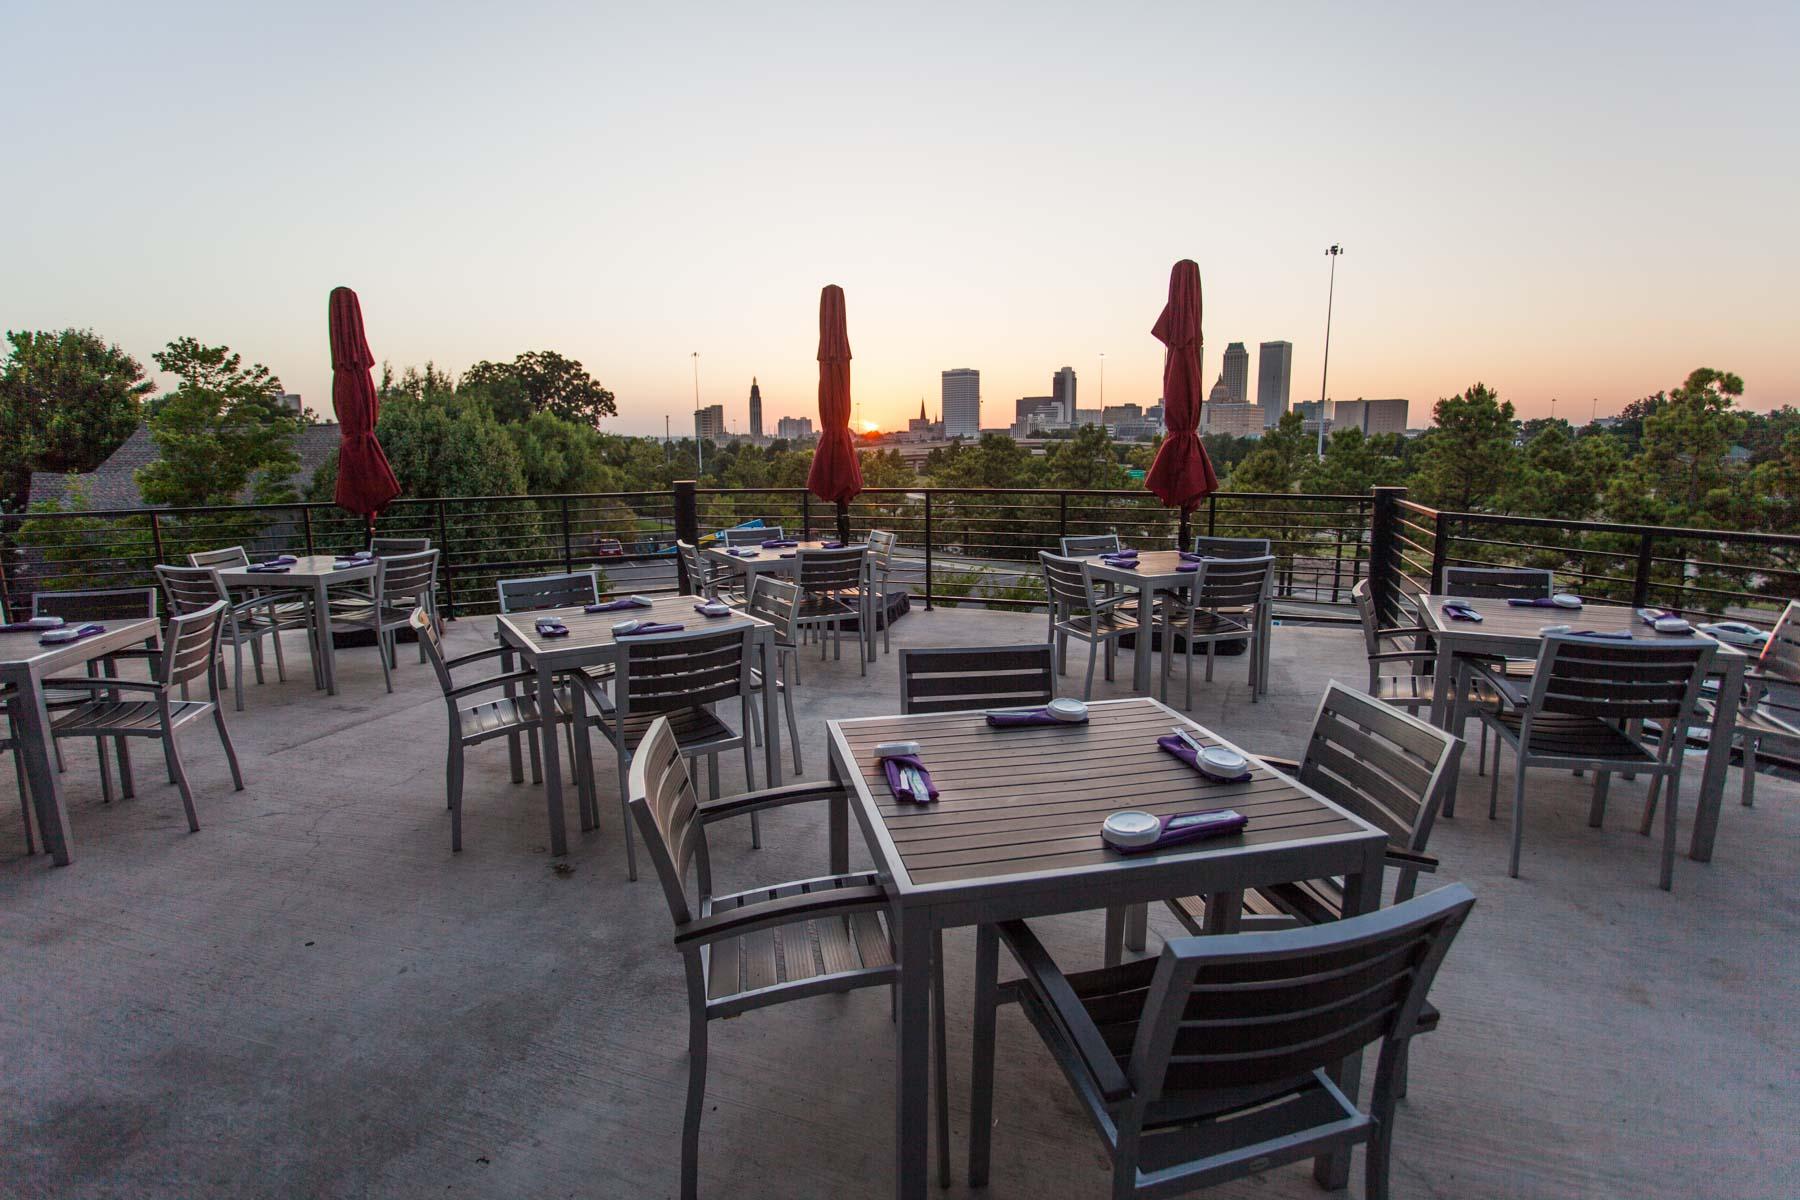 Best Tulsa Outdoor Patio Dining Restaruants Around Town